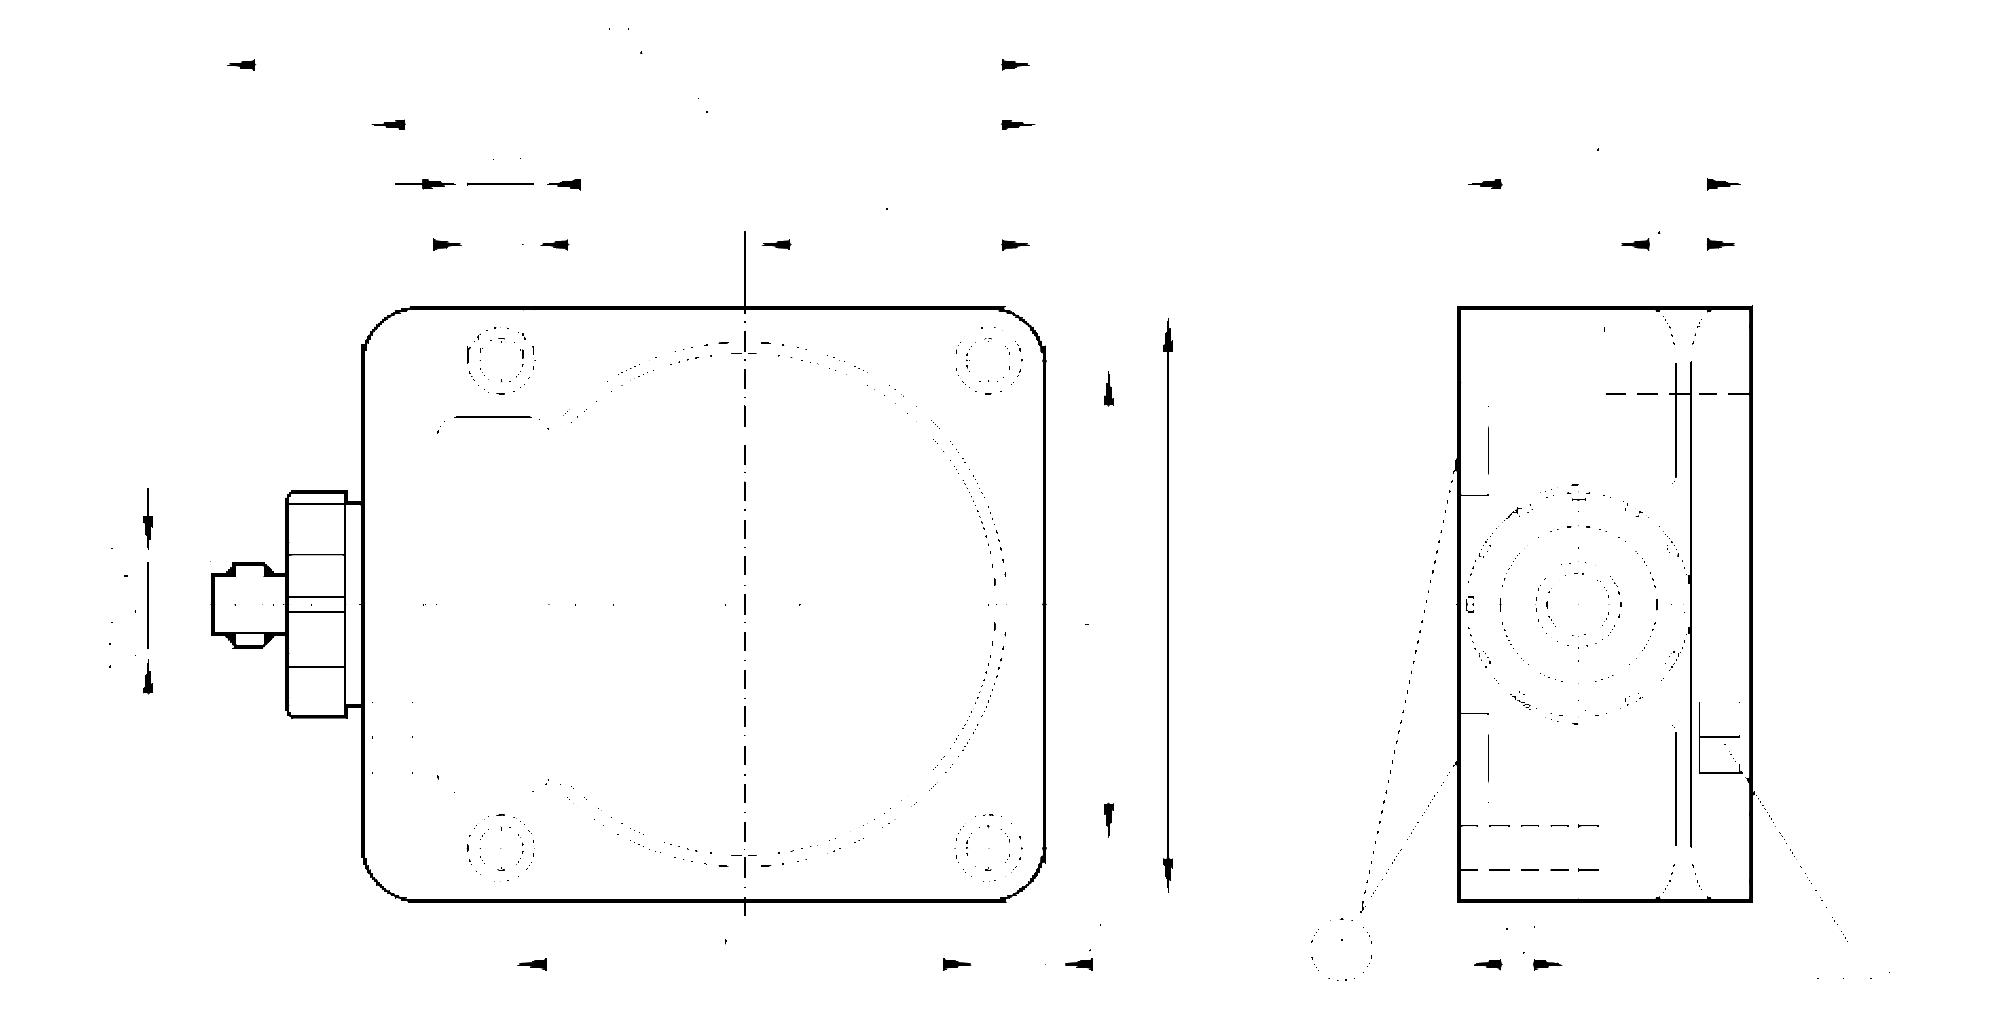 id5055 - inductive sensor